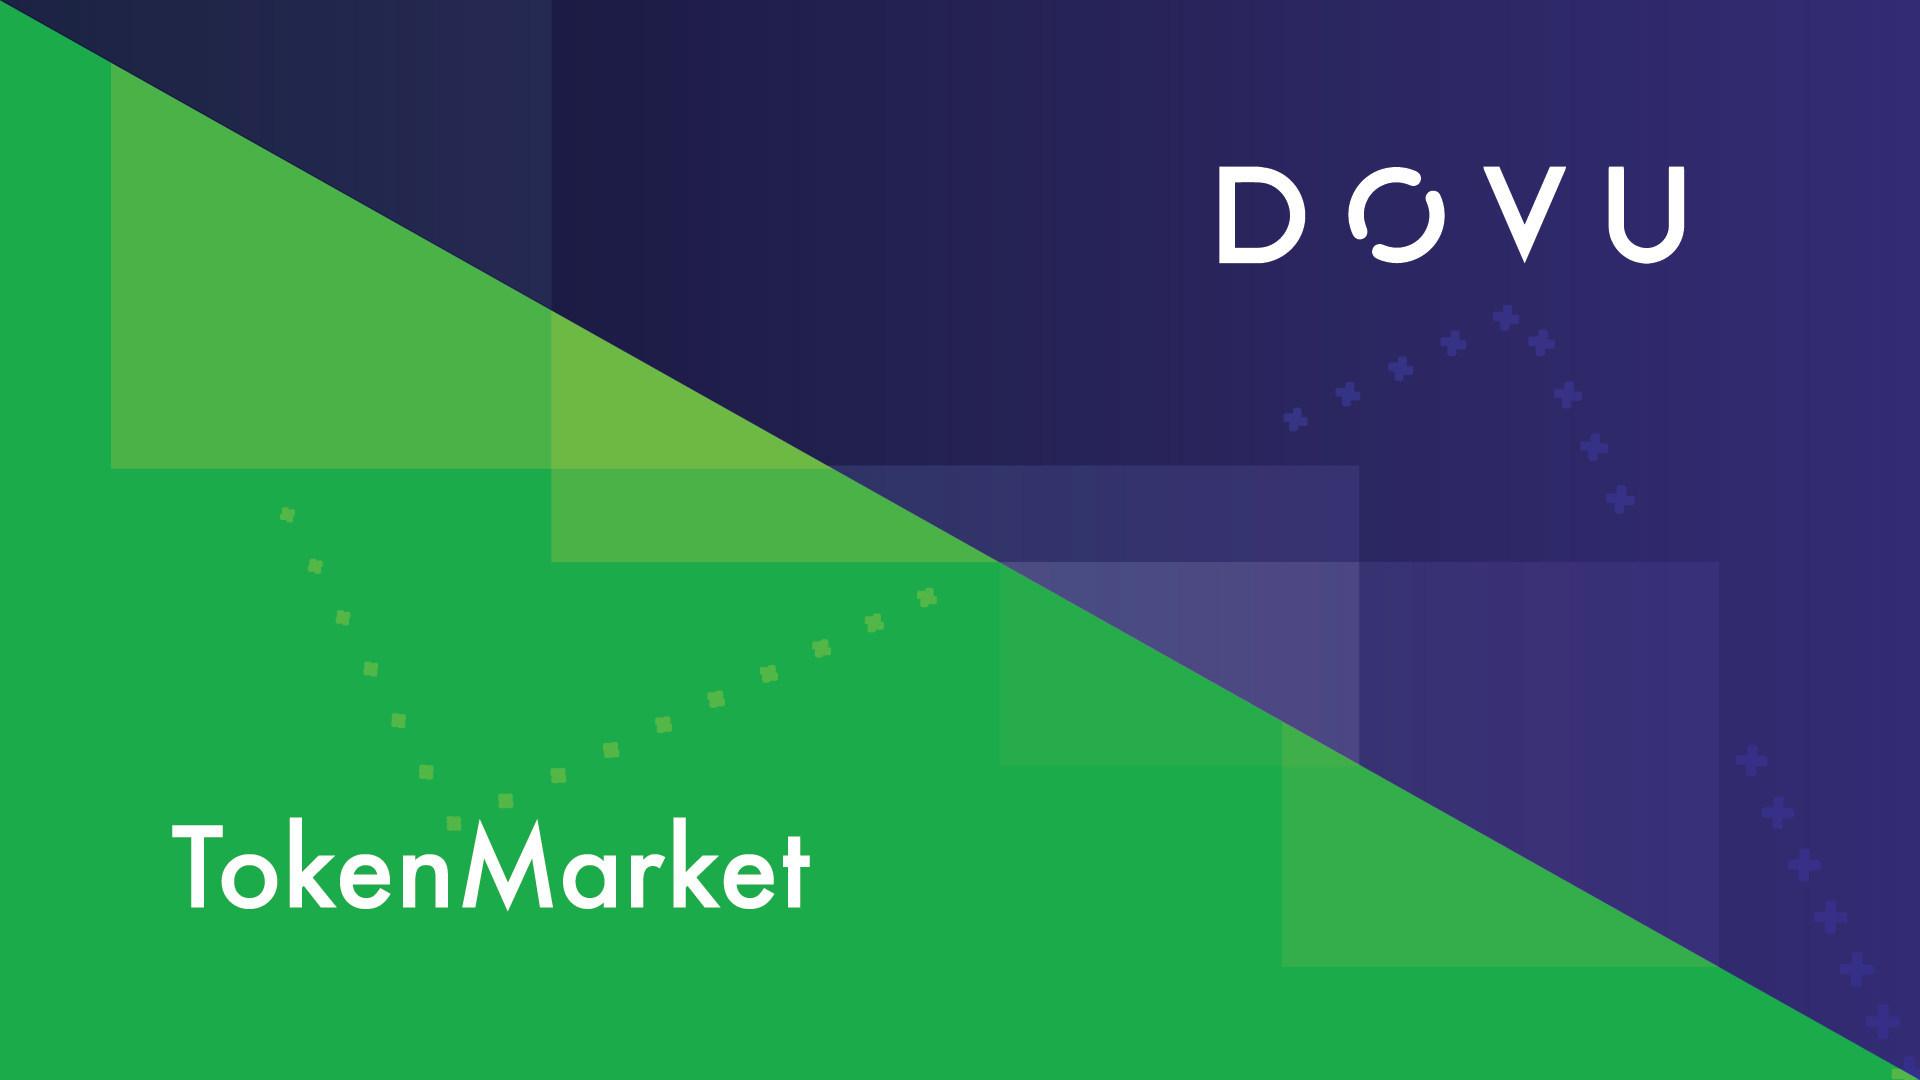 DOVU announces Security Token Offering for April 2019 (PRNewsfoto/DOVU)